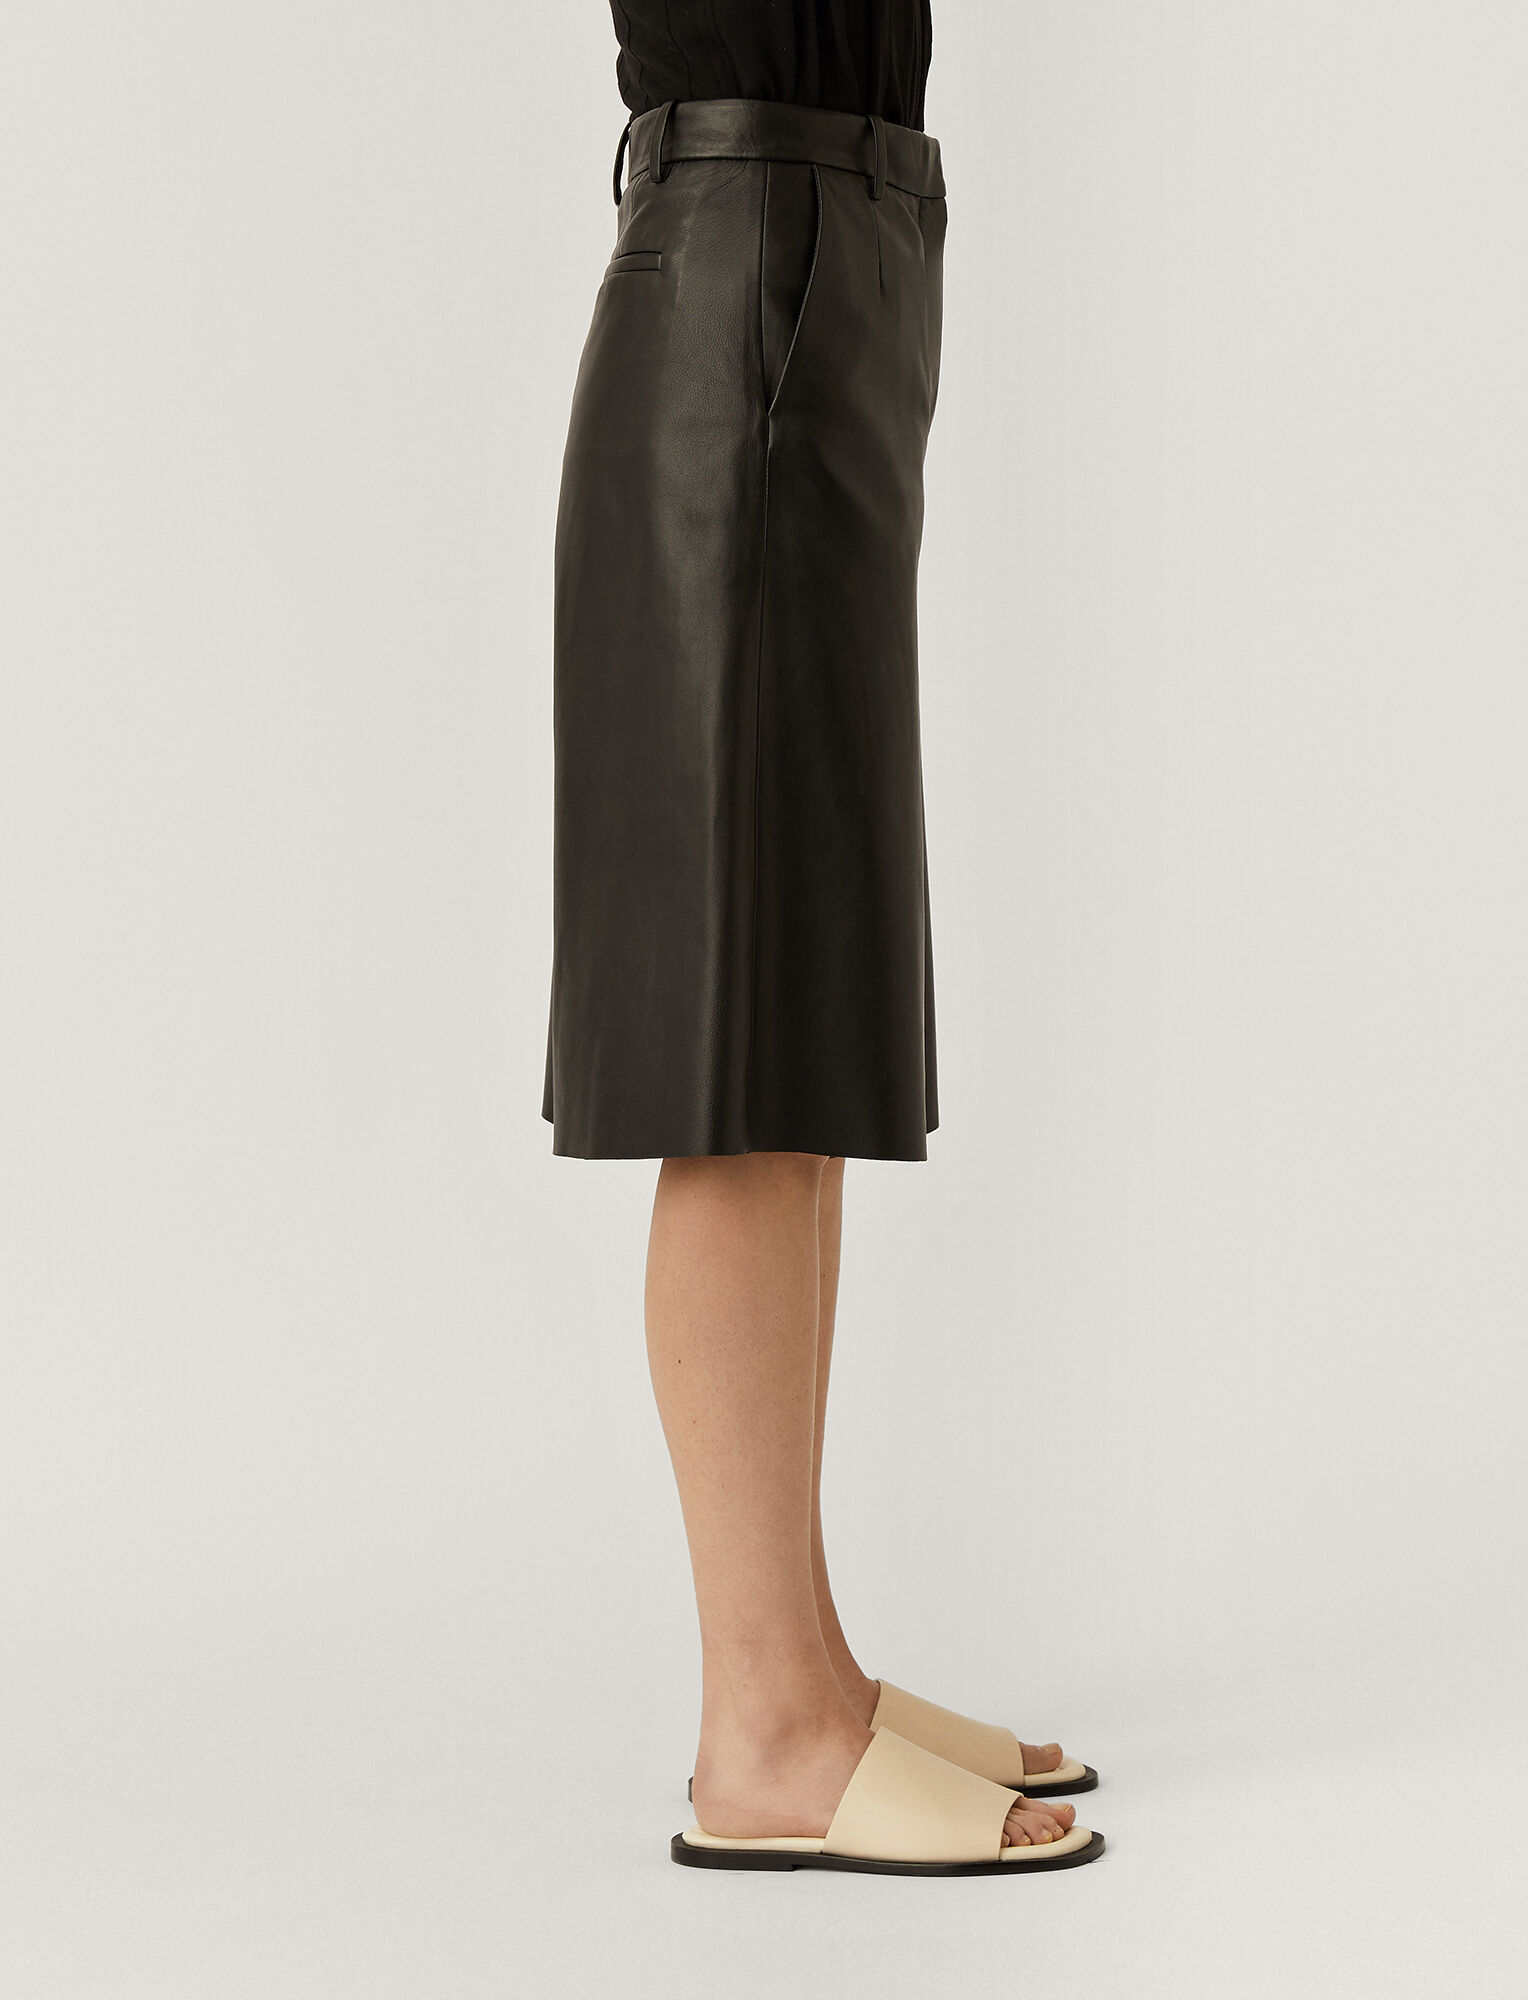 Joseph, Nappa Leather Teresa Shorts, in BLACK